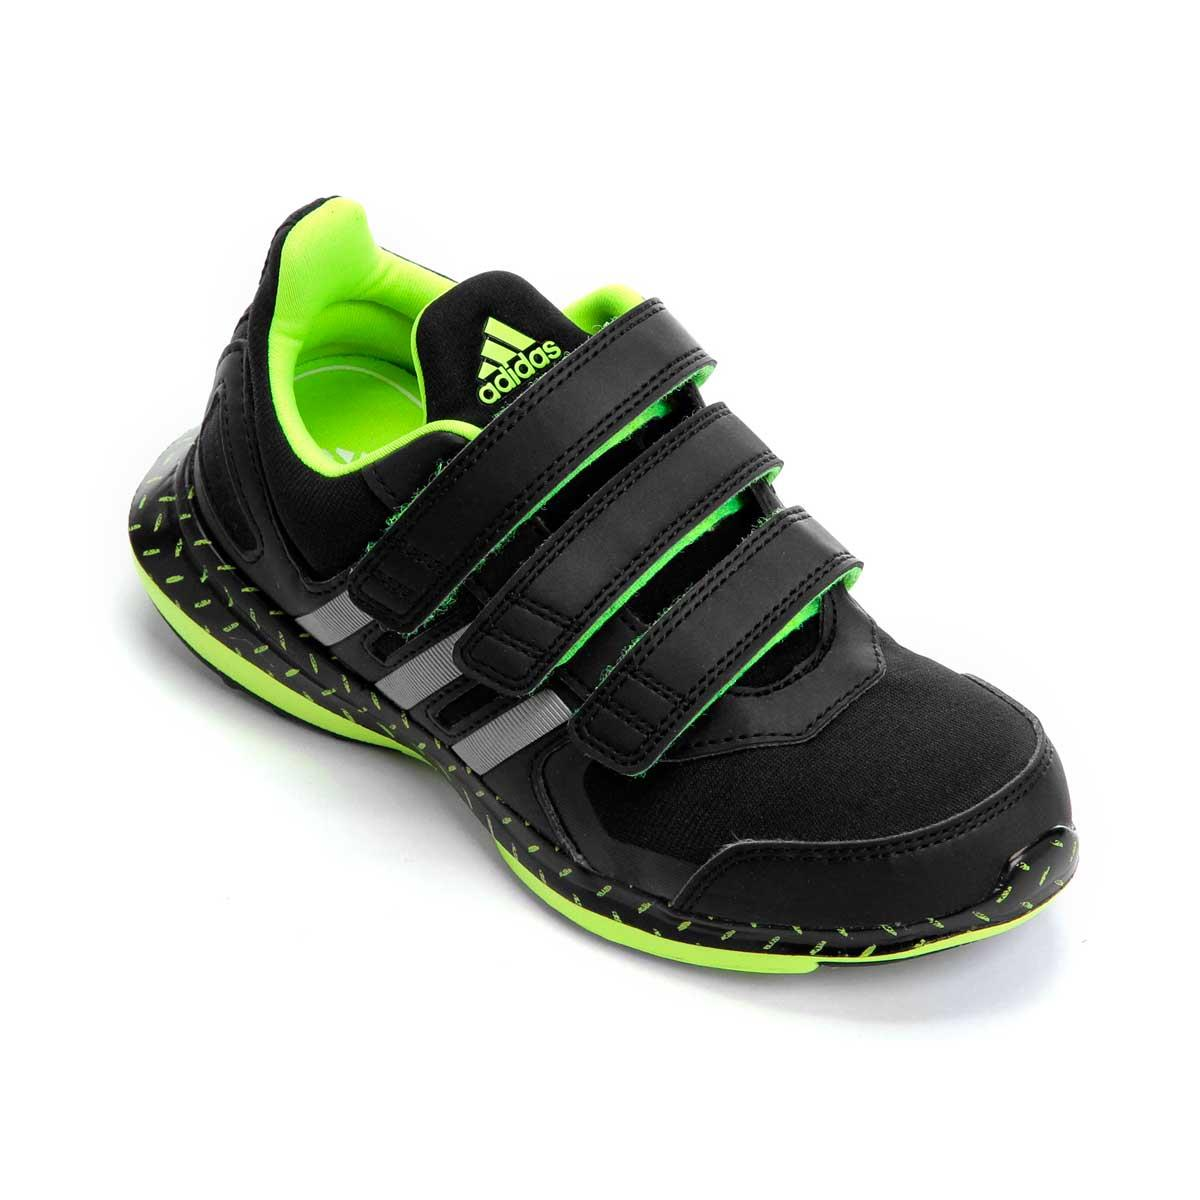 1f0912eab54 Tênis Adidas Hyperfast 2 Cf K Infantil